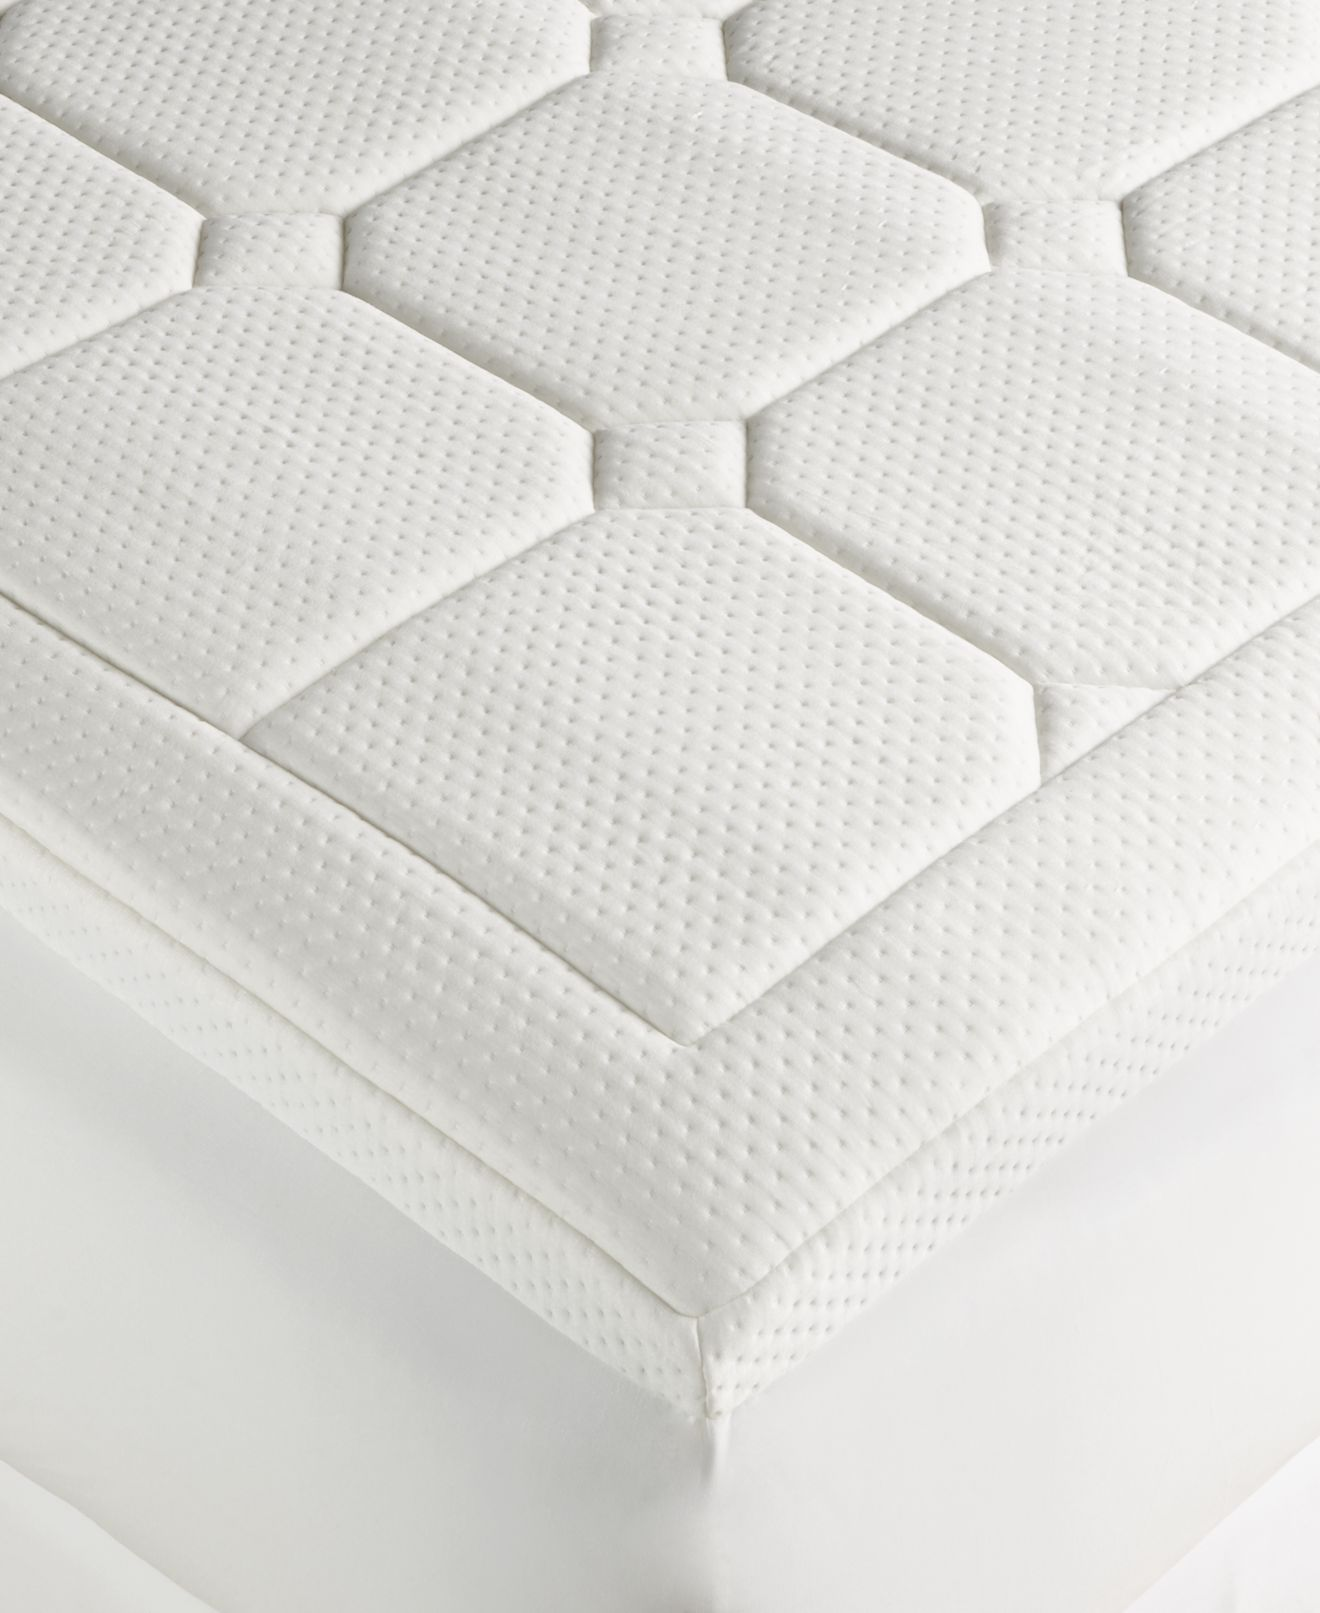 mattress pads mattress toppers and pads macy u0027s